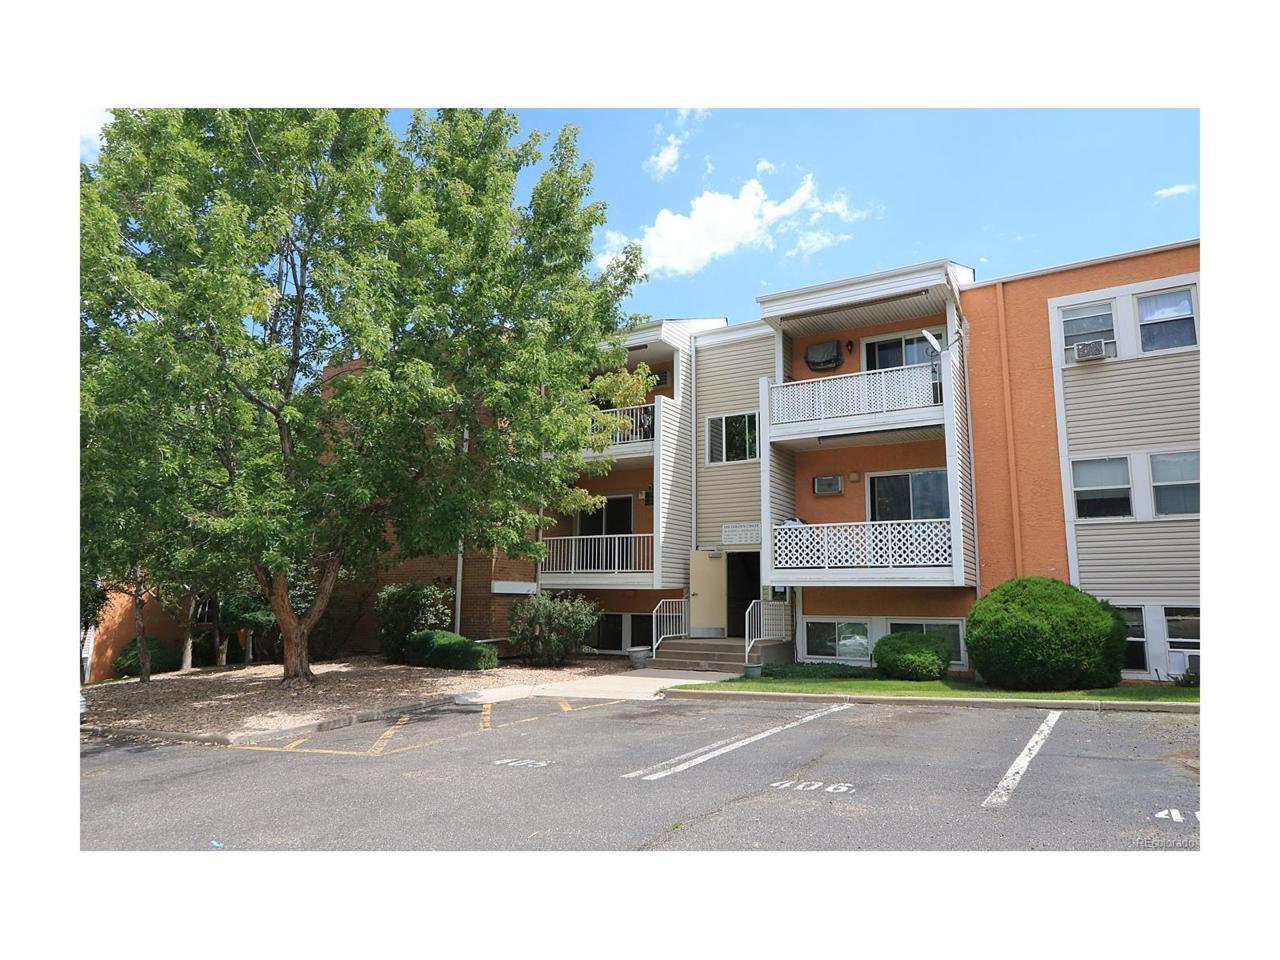 1400 Golden Circle #207, Golden, CO 80401 (MLS #6424428) :: 8z Real Estate